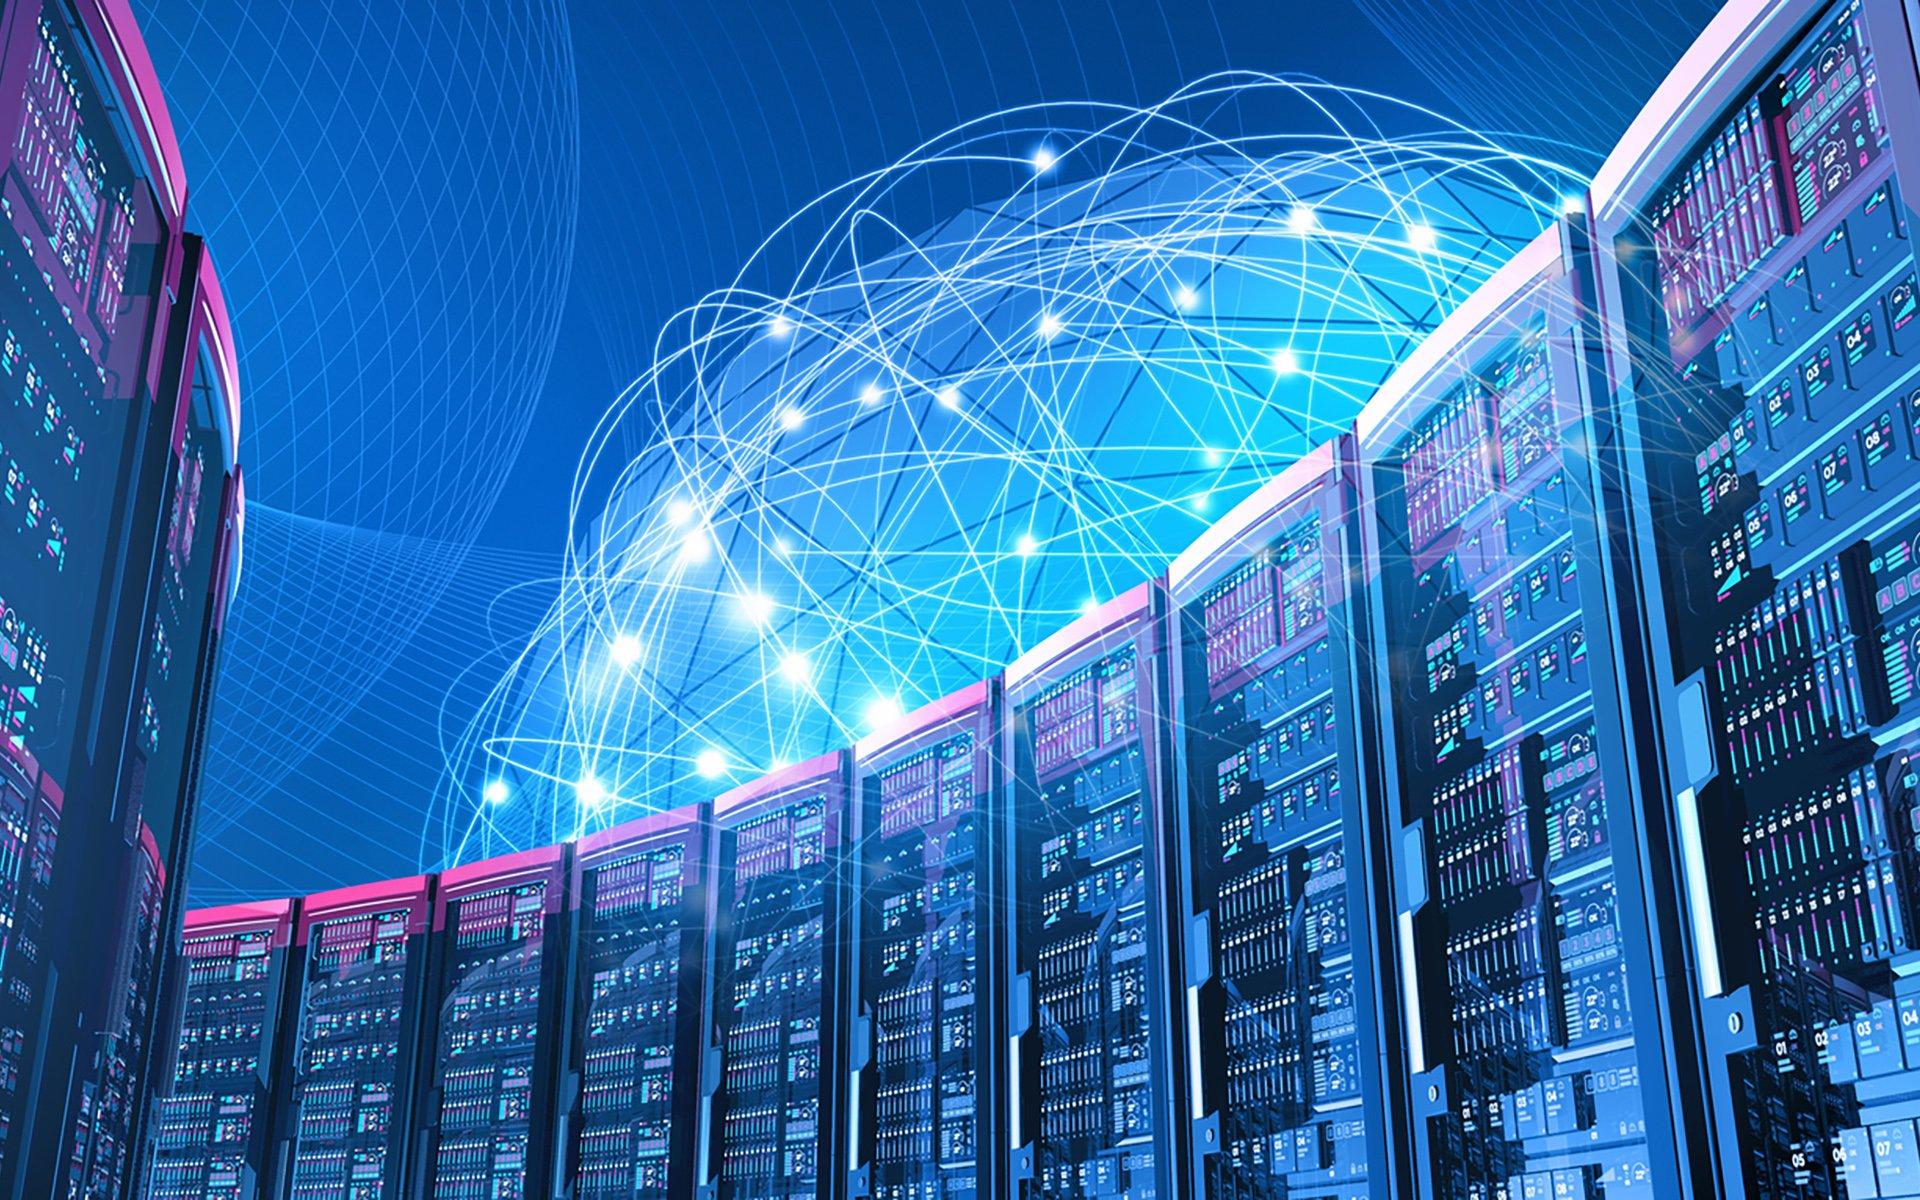 Hackers Breach Amazon Cloud to Mine Bitcoin